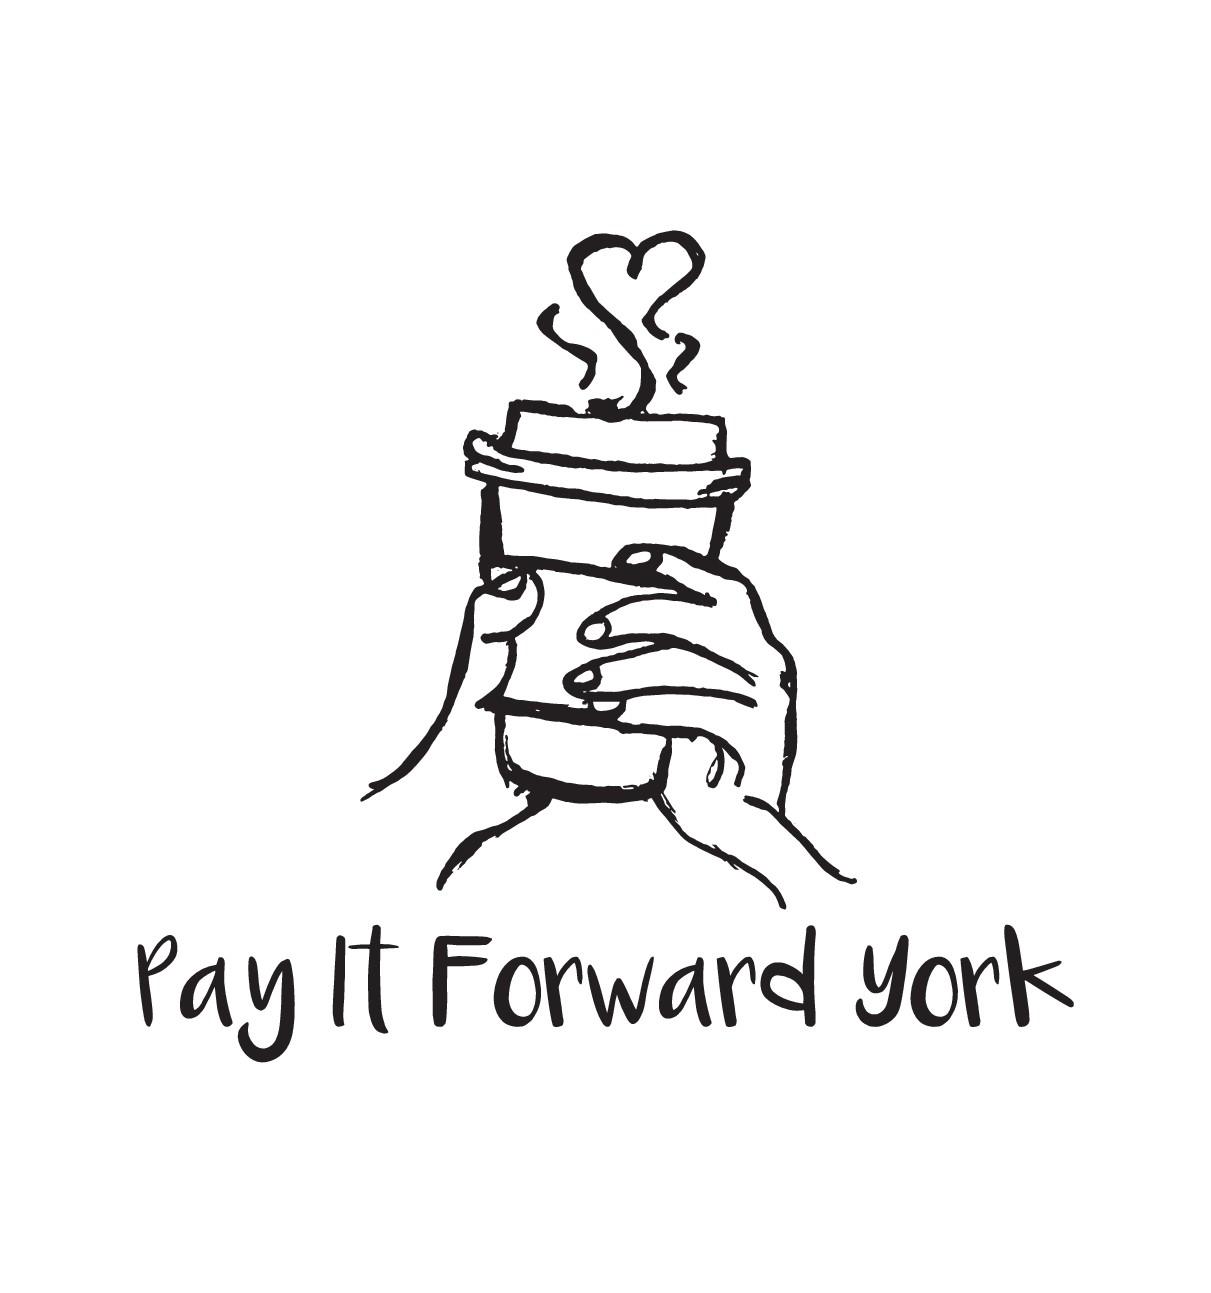 Pay It Forward York